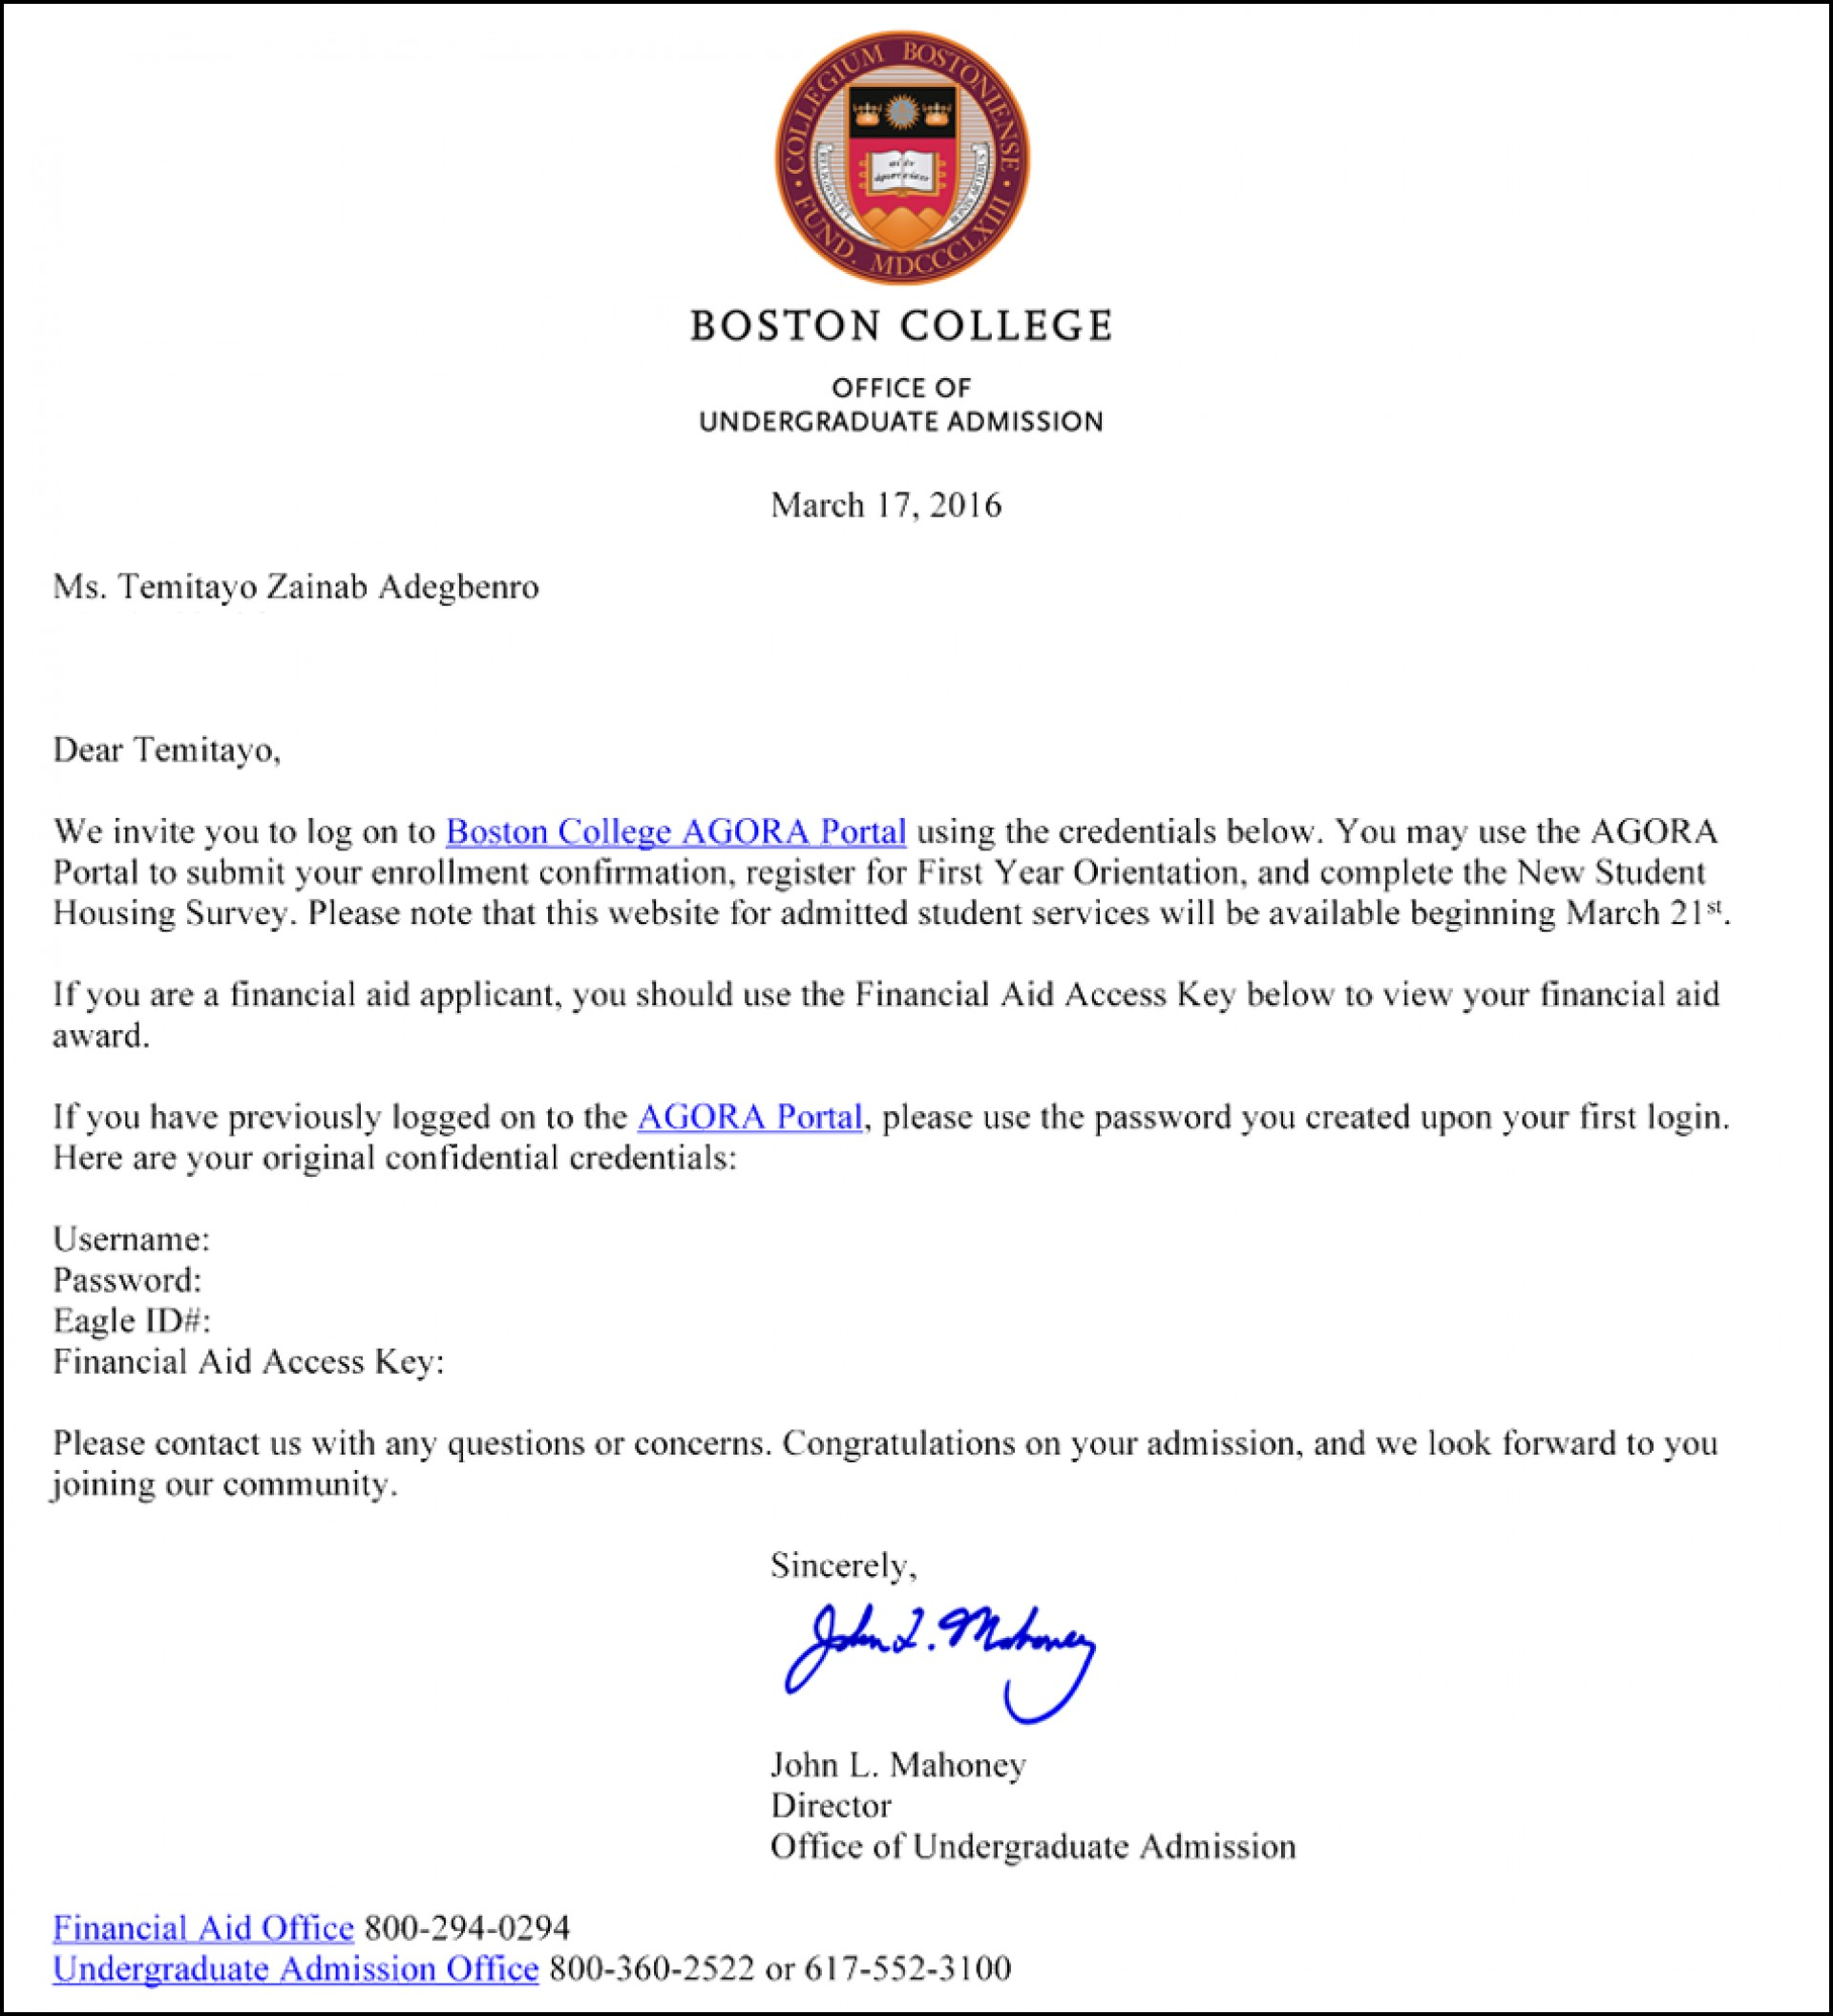 005 Sat Prep Classes Exam Tutor Queens College Admission Essay Bost Application Rates Unique Free Near Me Toronto 1920